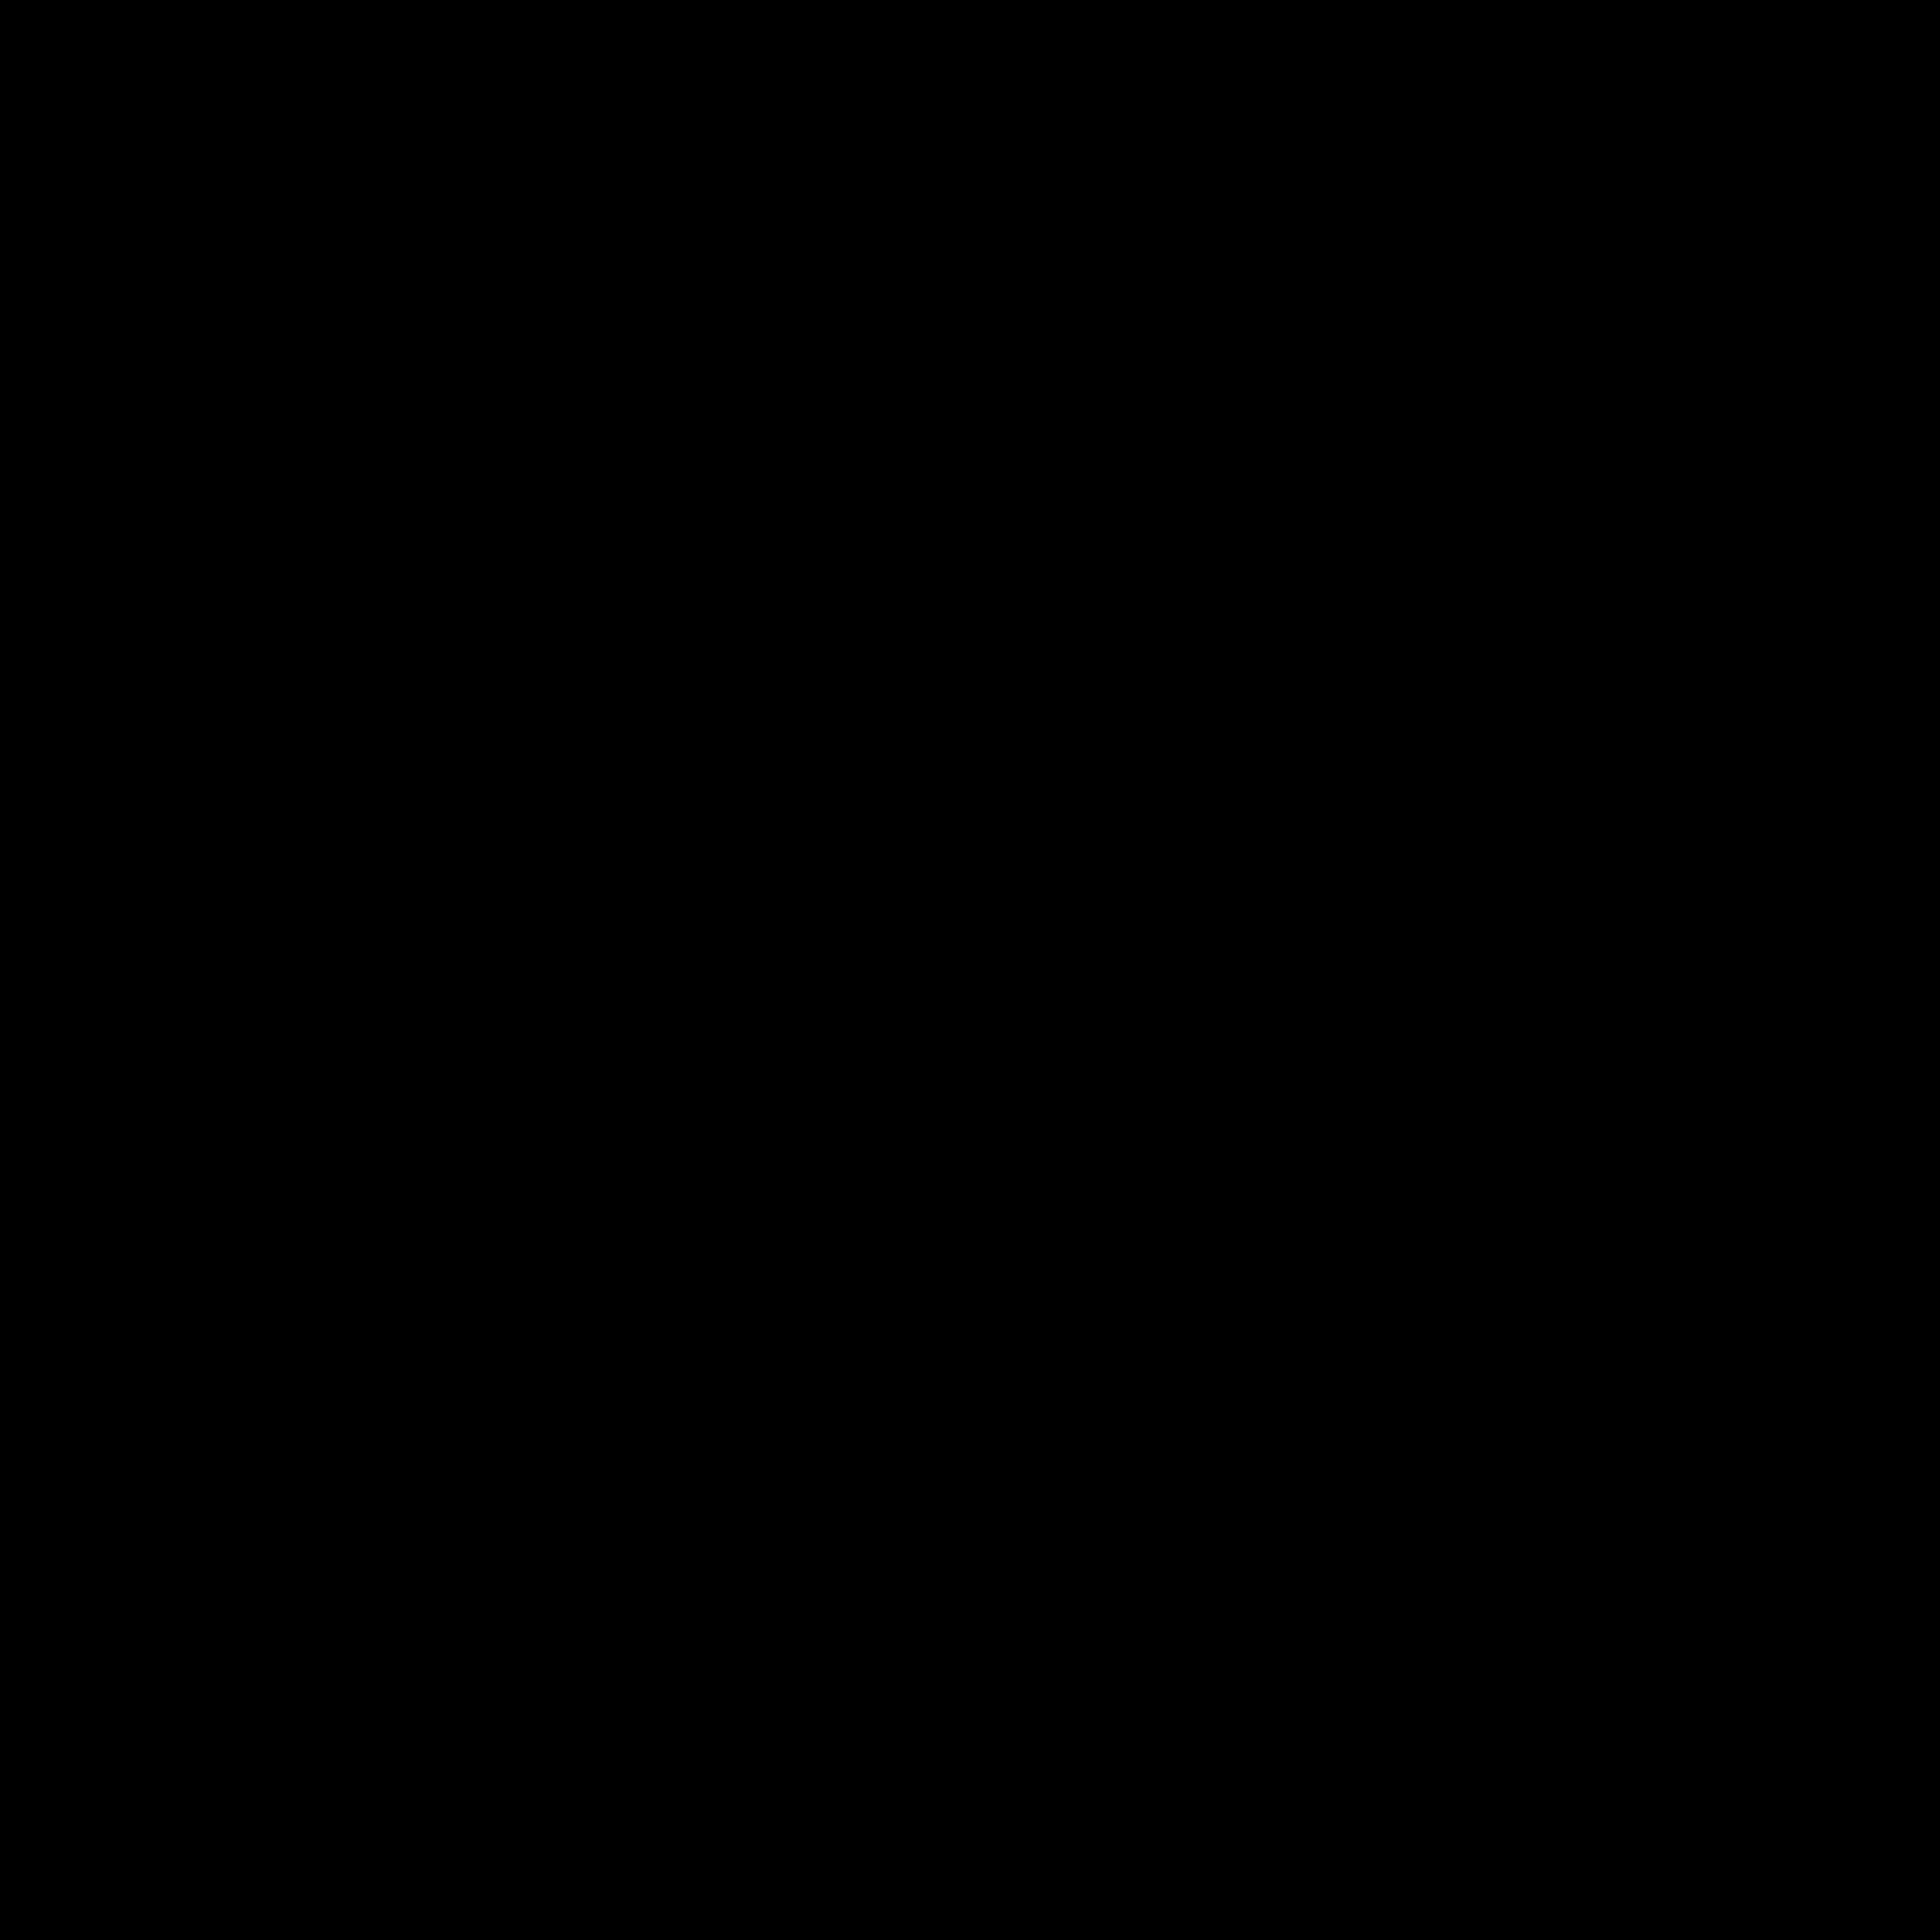 graphic black and white download Black clip letter. T png doki okimarket